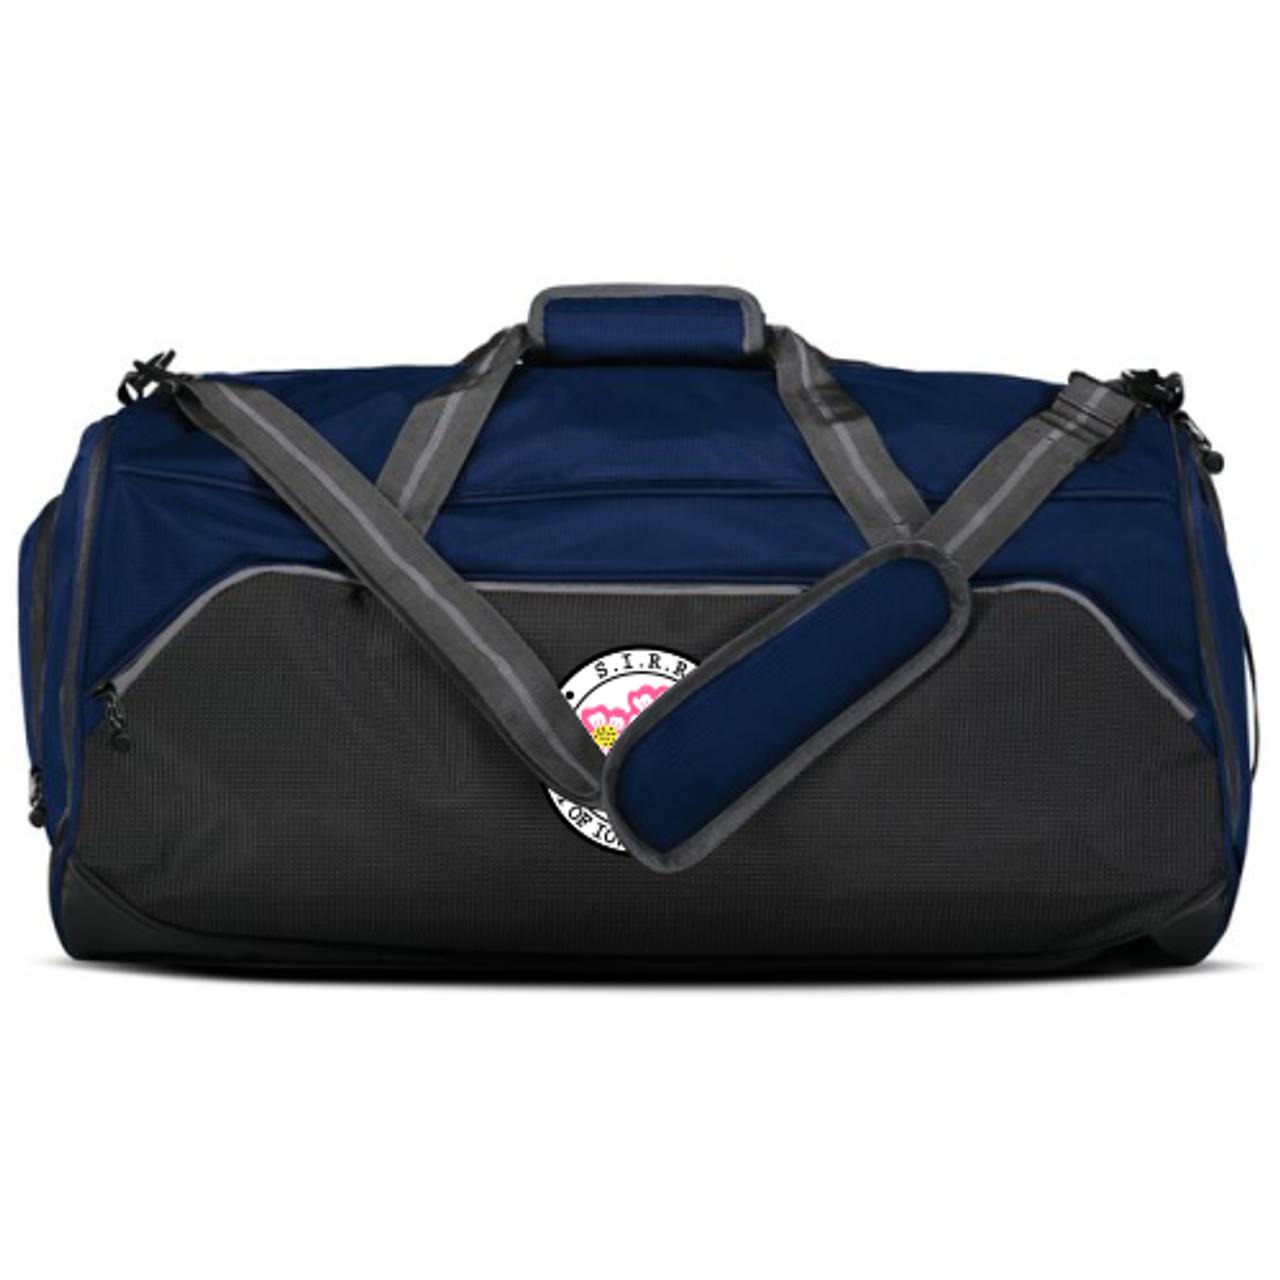 SIRR Backpack Duffel